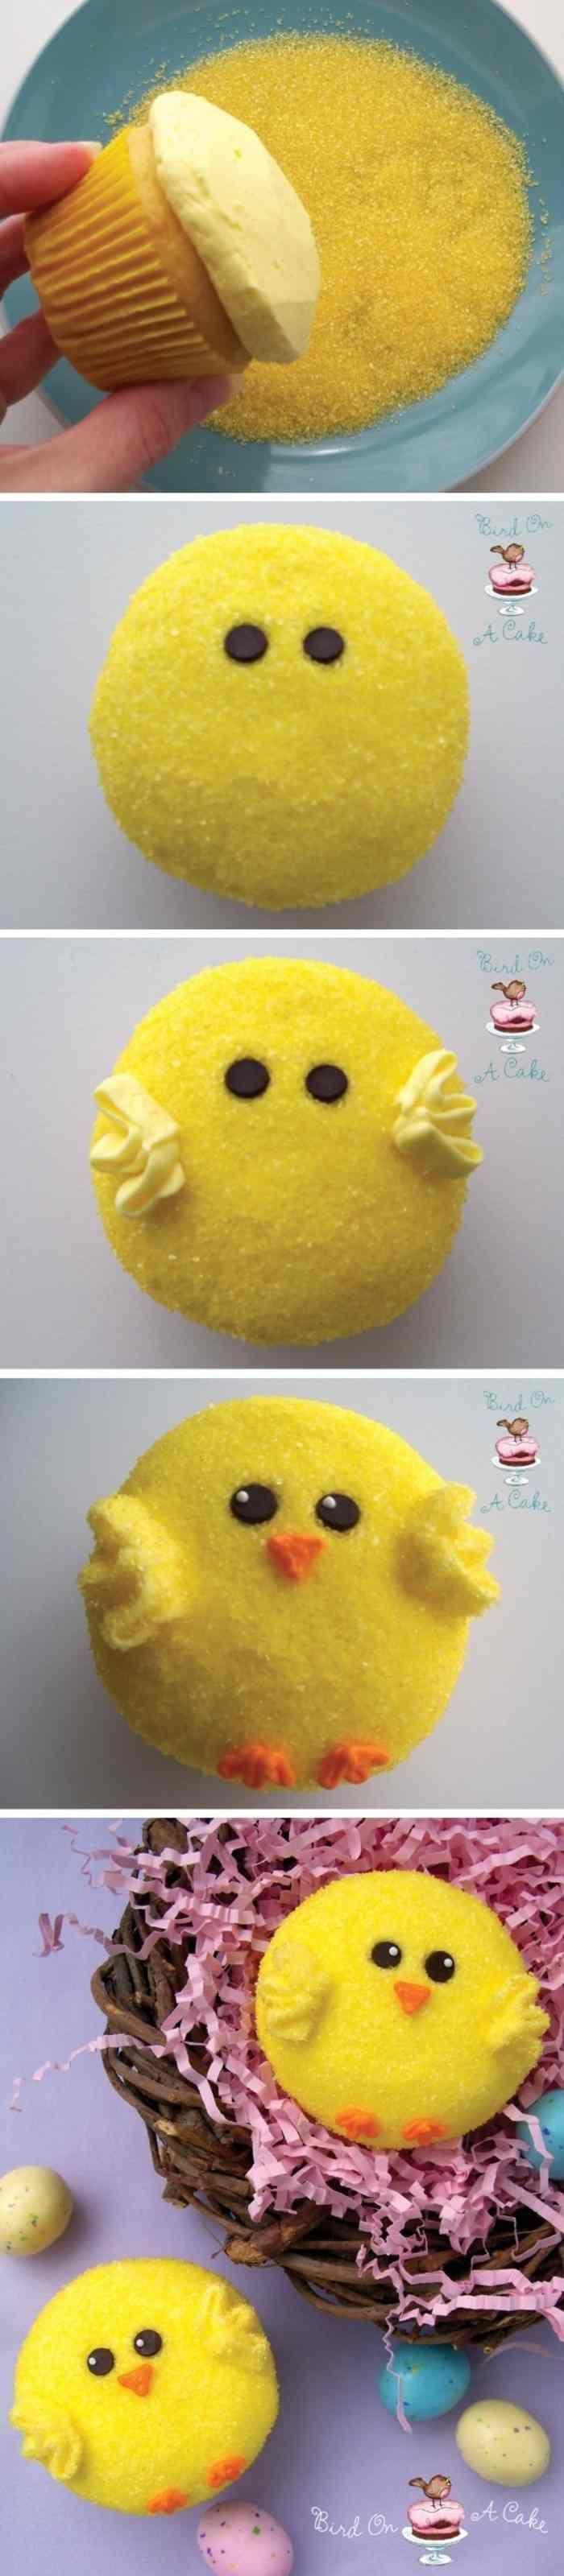 Cupcakes wie gelbe Küken selber machen